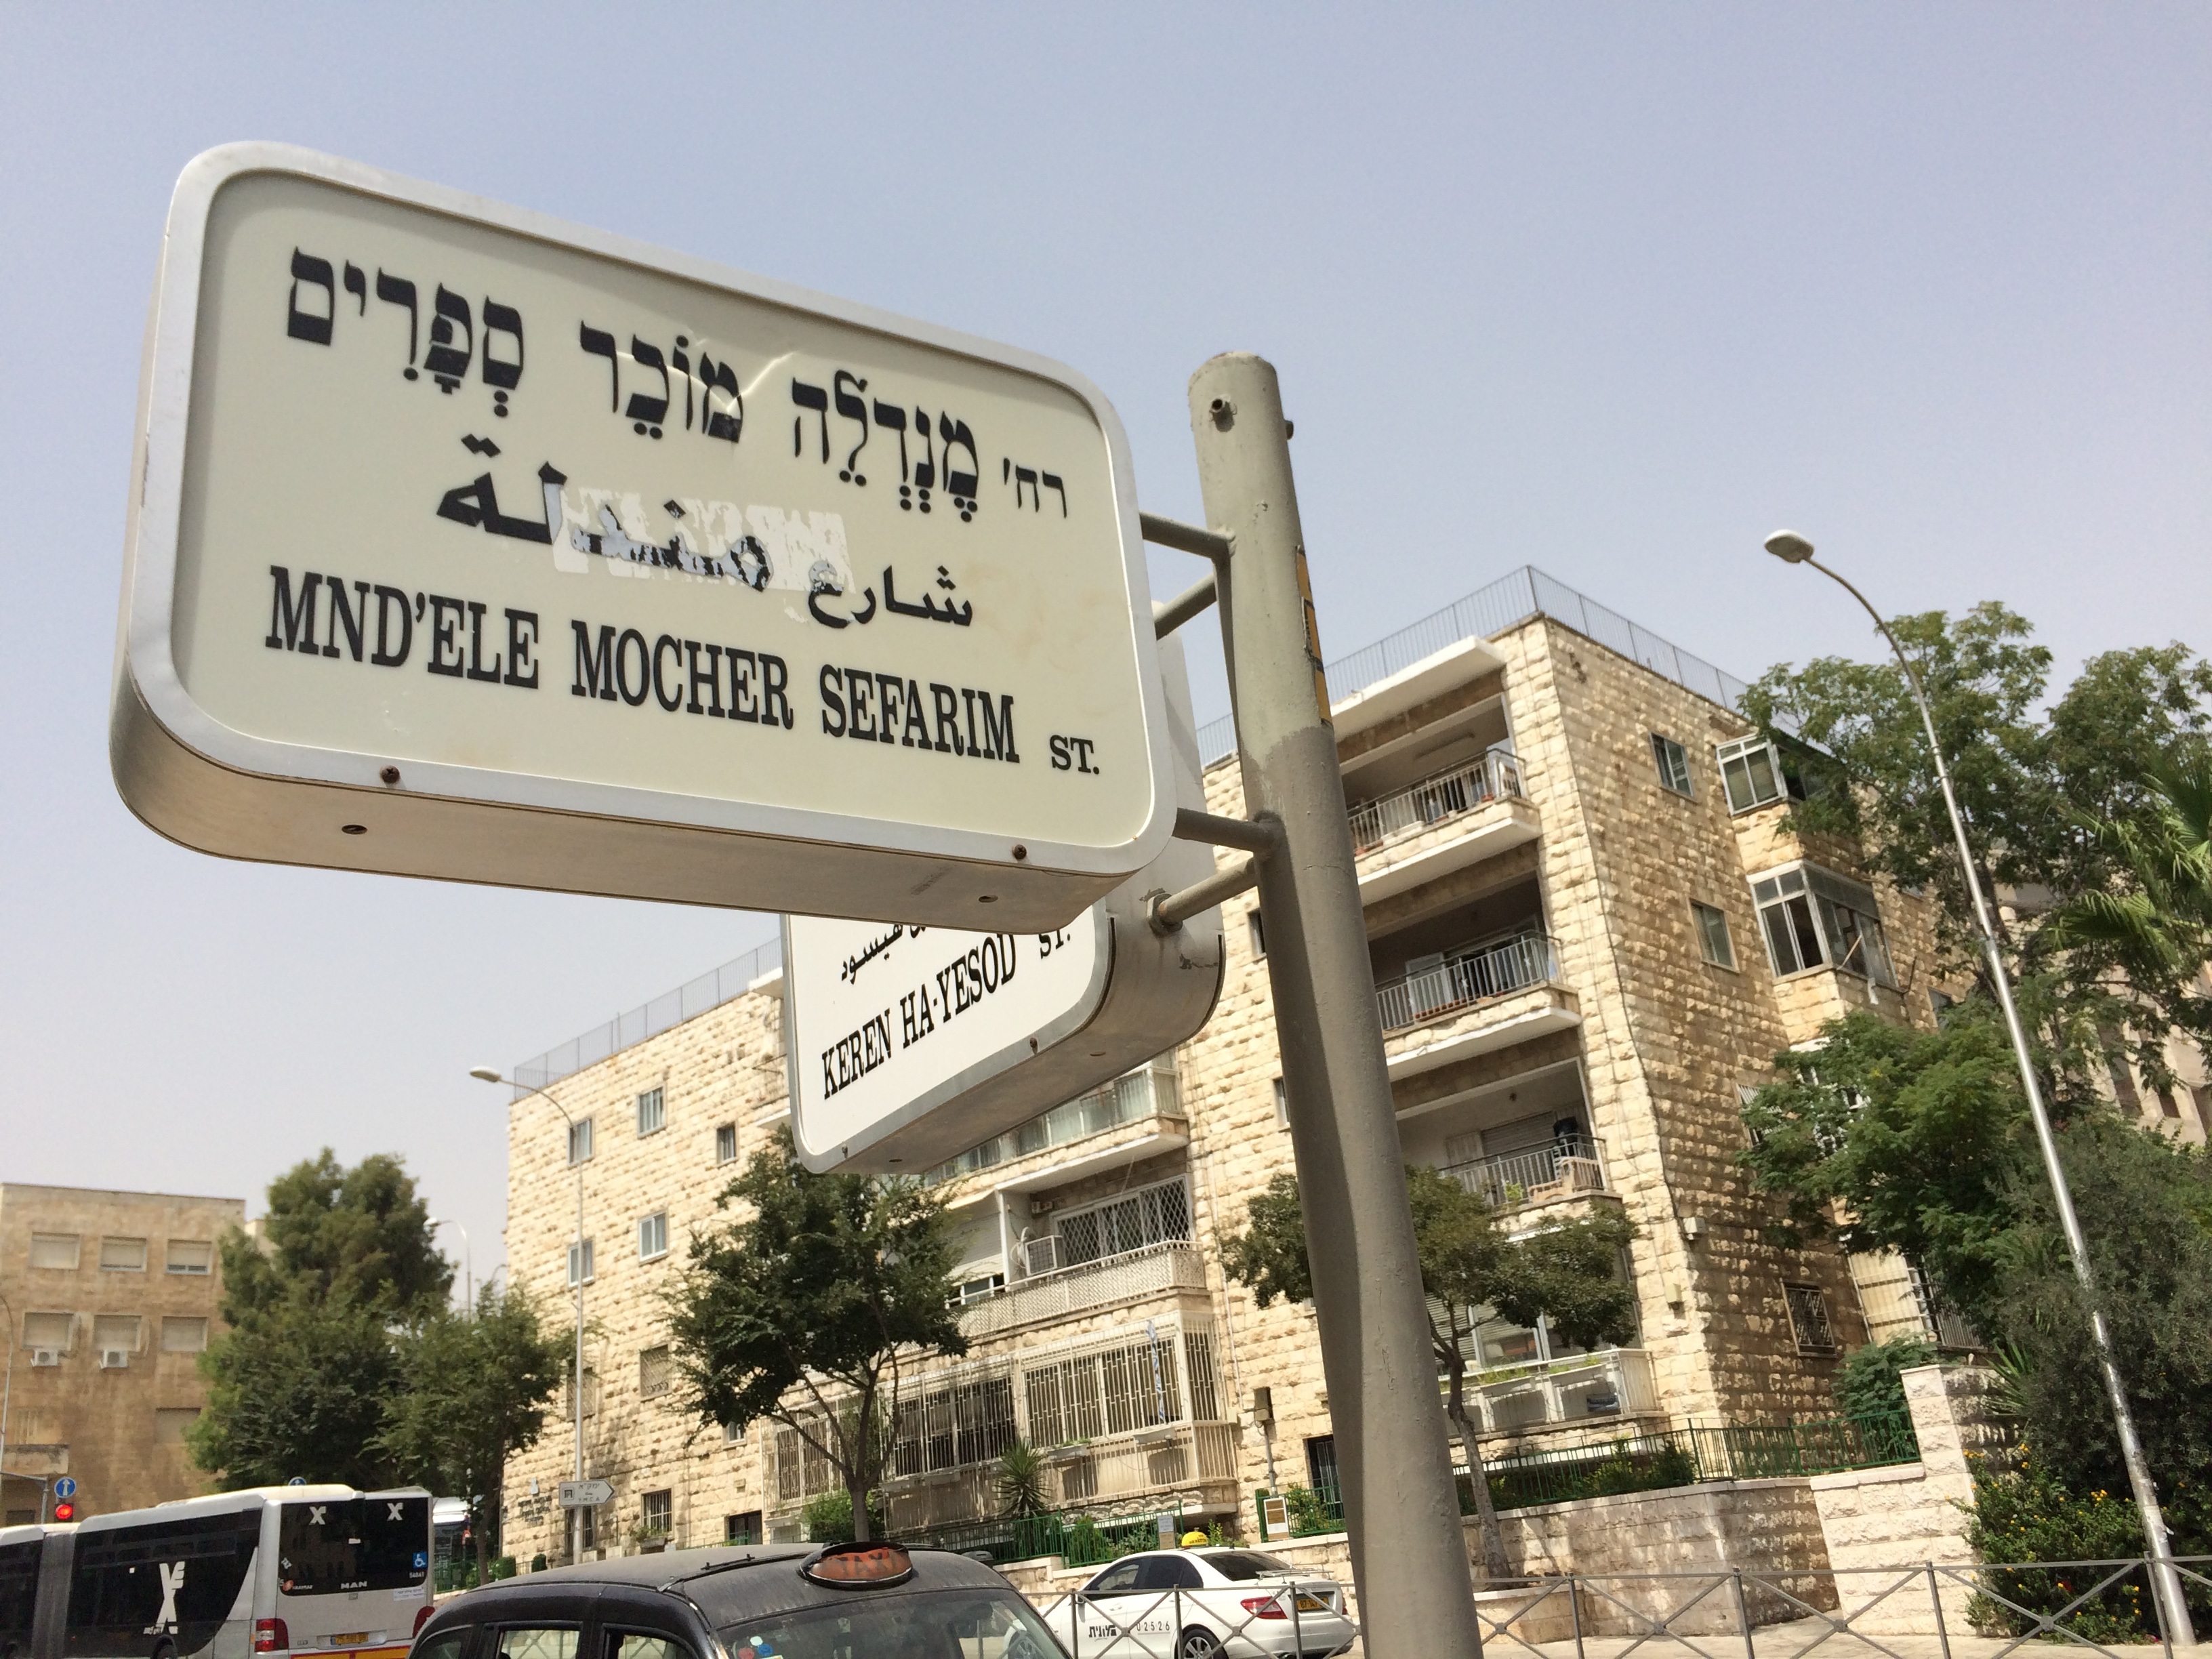 Jutzot Ierushalaim – XI – Las calles de Jerusalém: Mendele Mojer Sforim